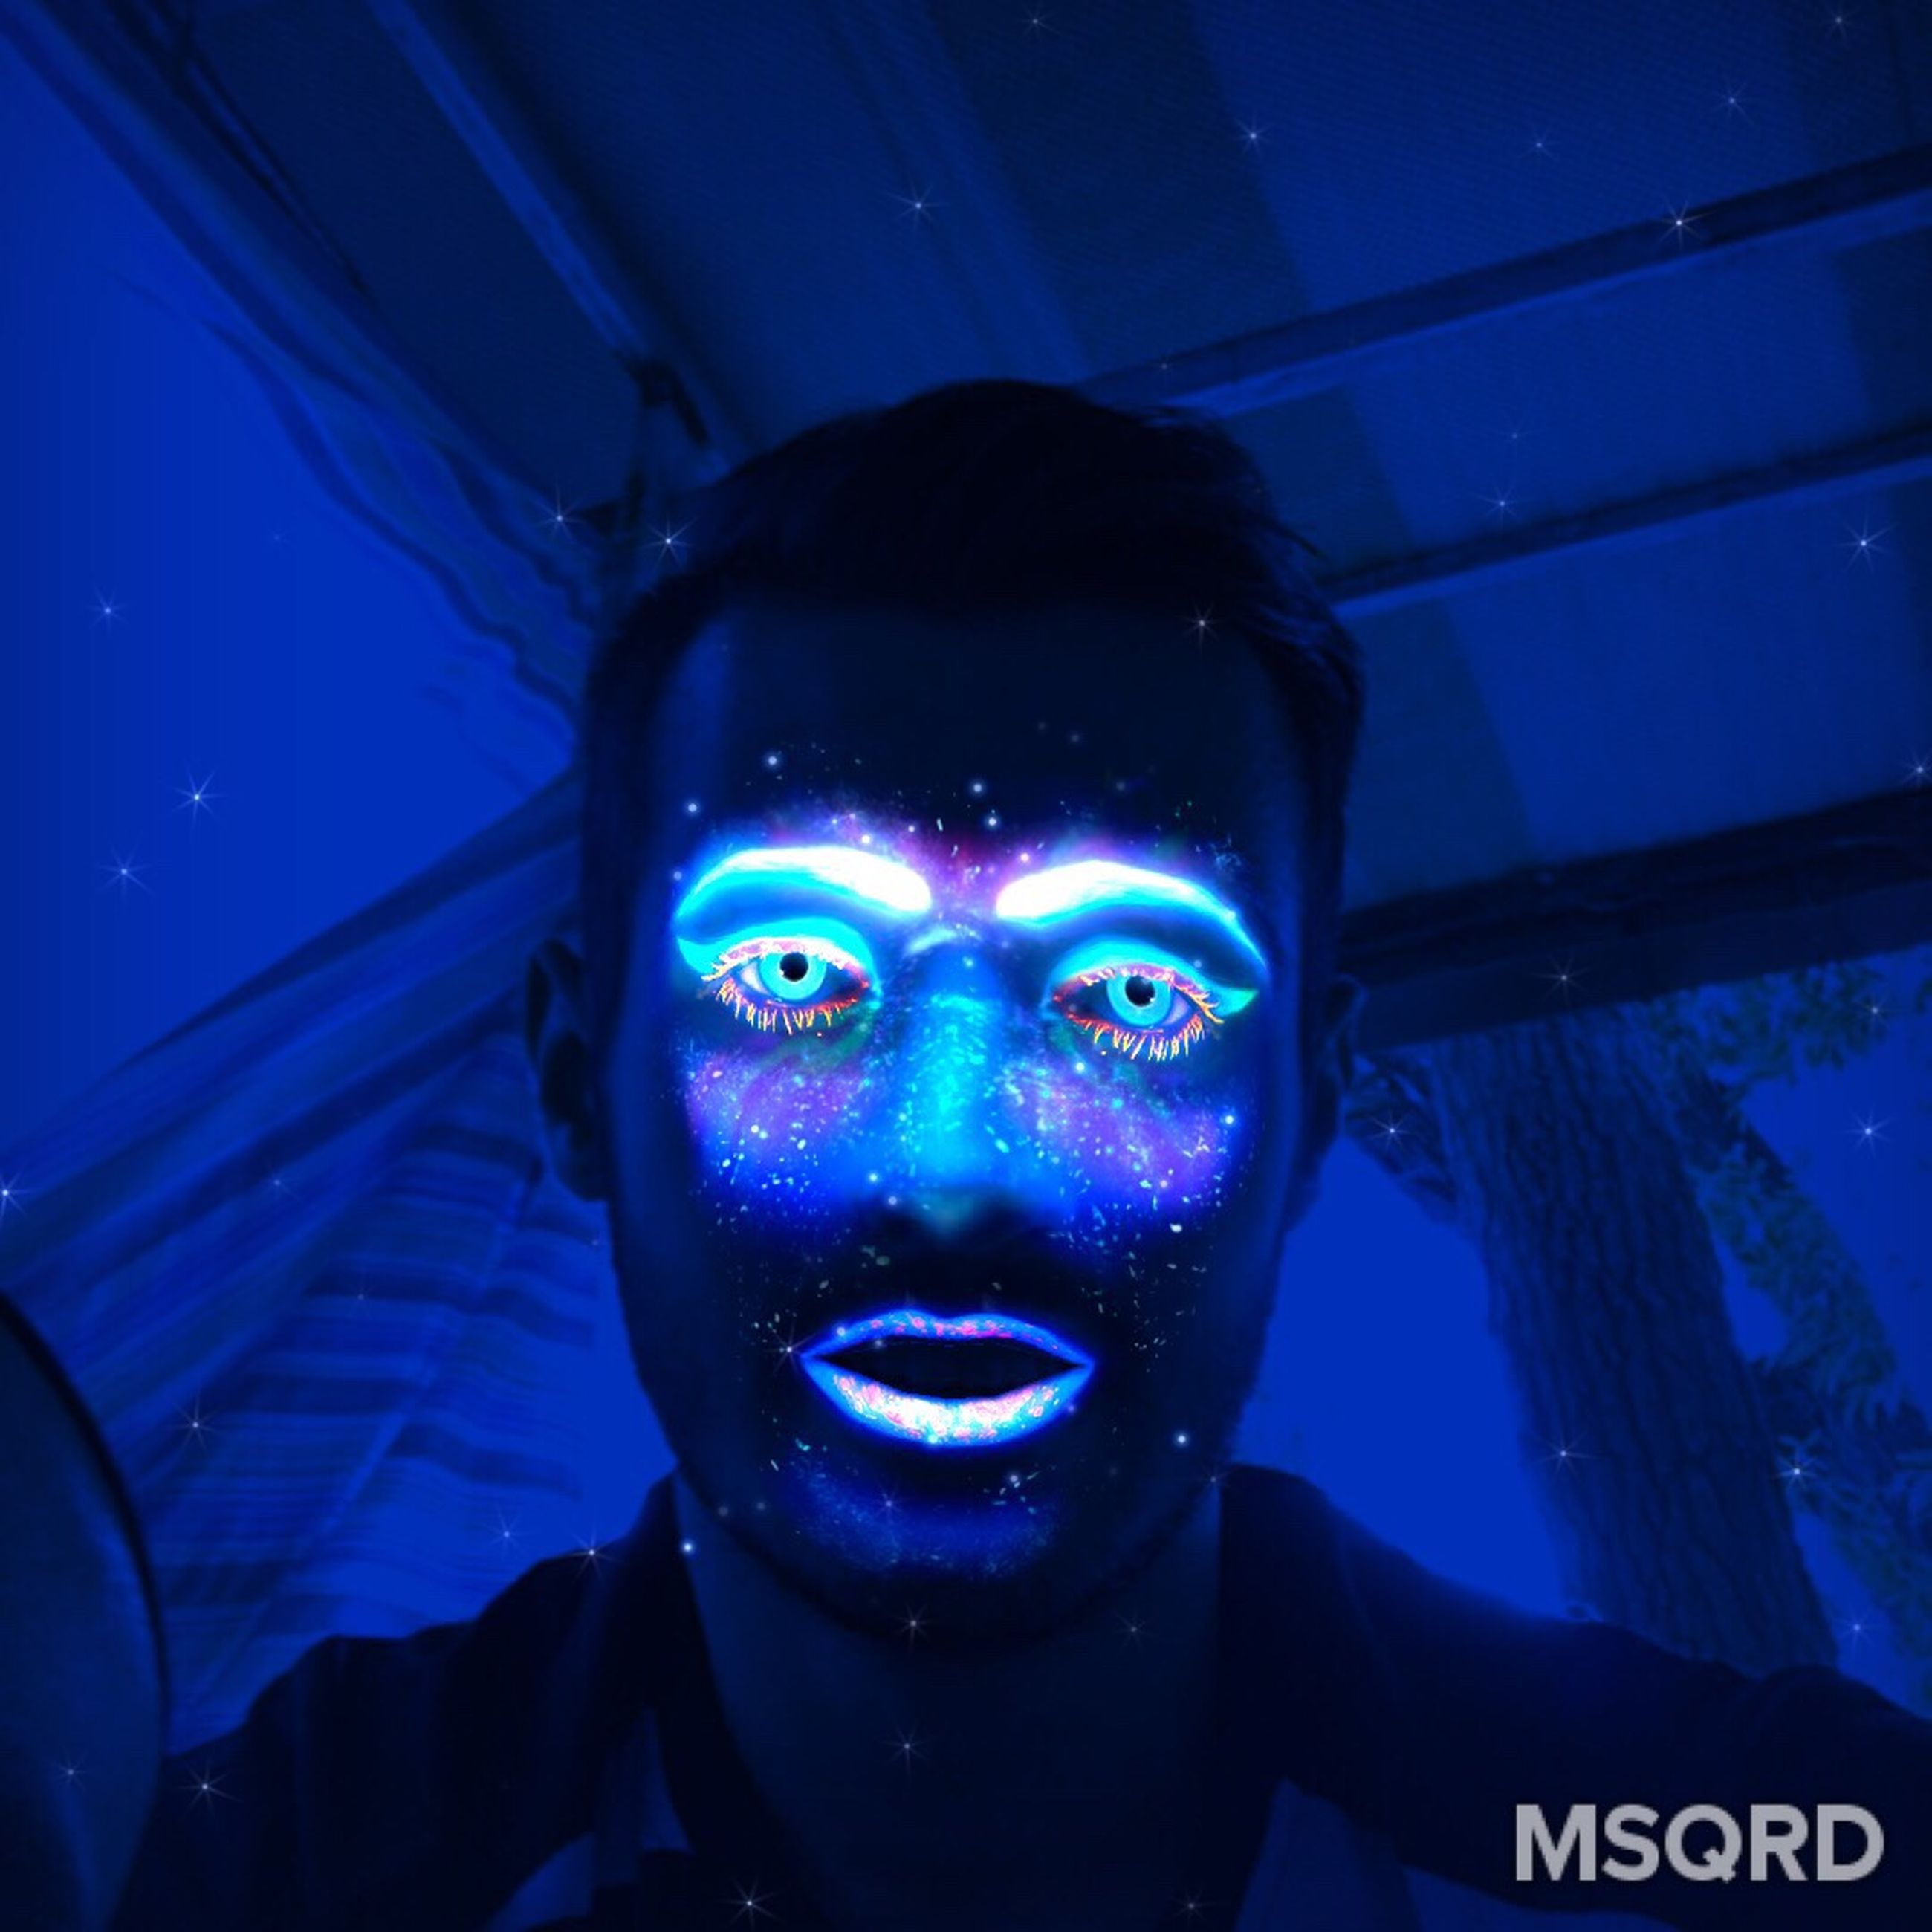 blue, portrait, headshot, close-up, illuminated, human face, lifestyles, leisure activity, focus on foreground